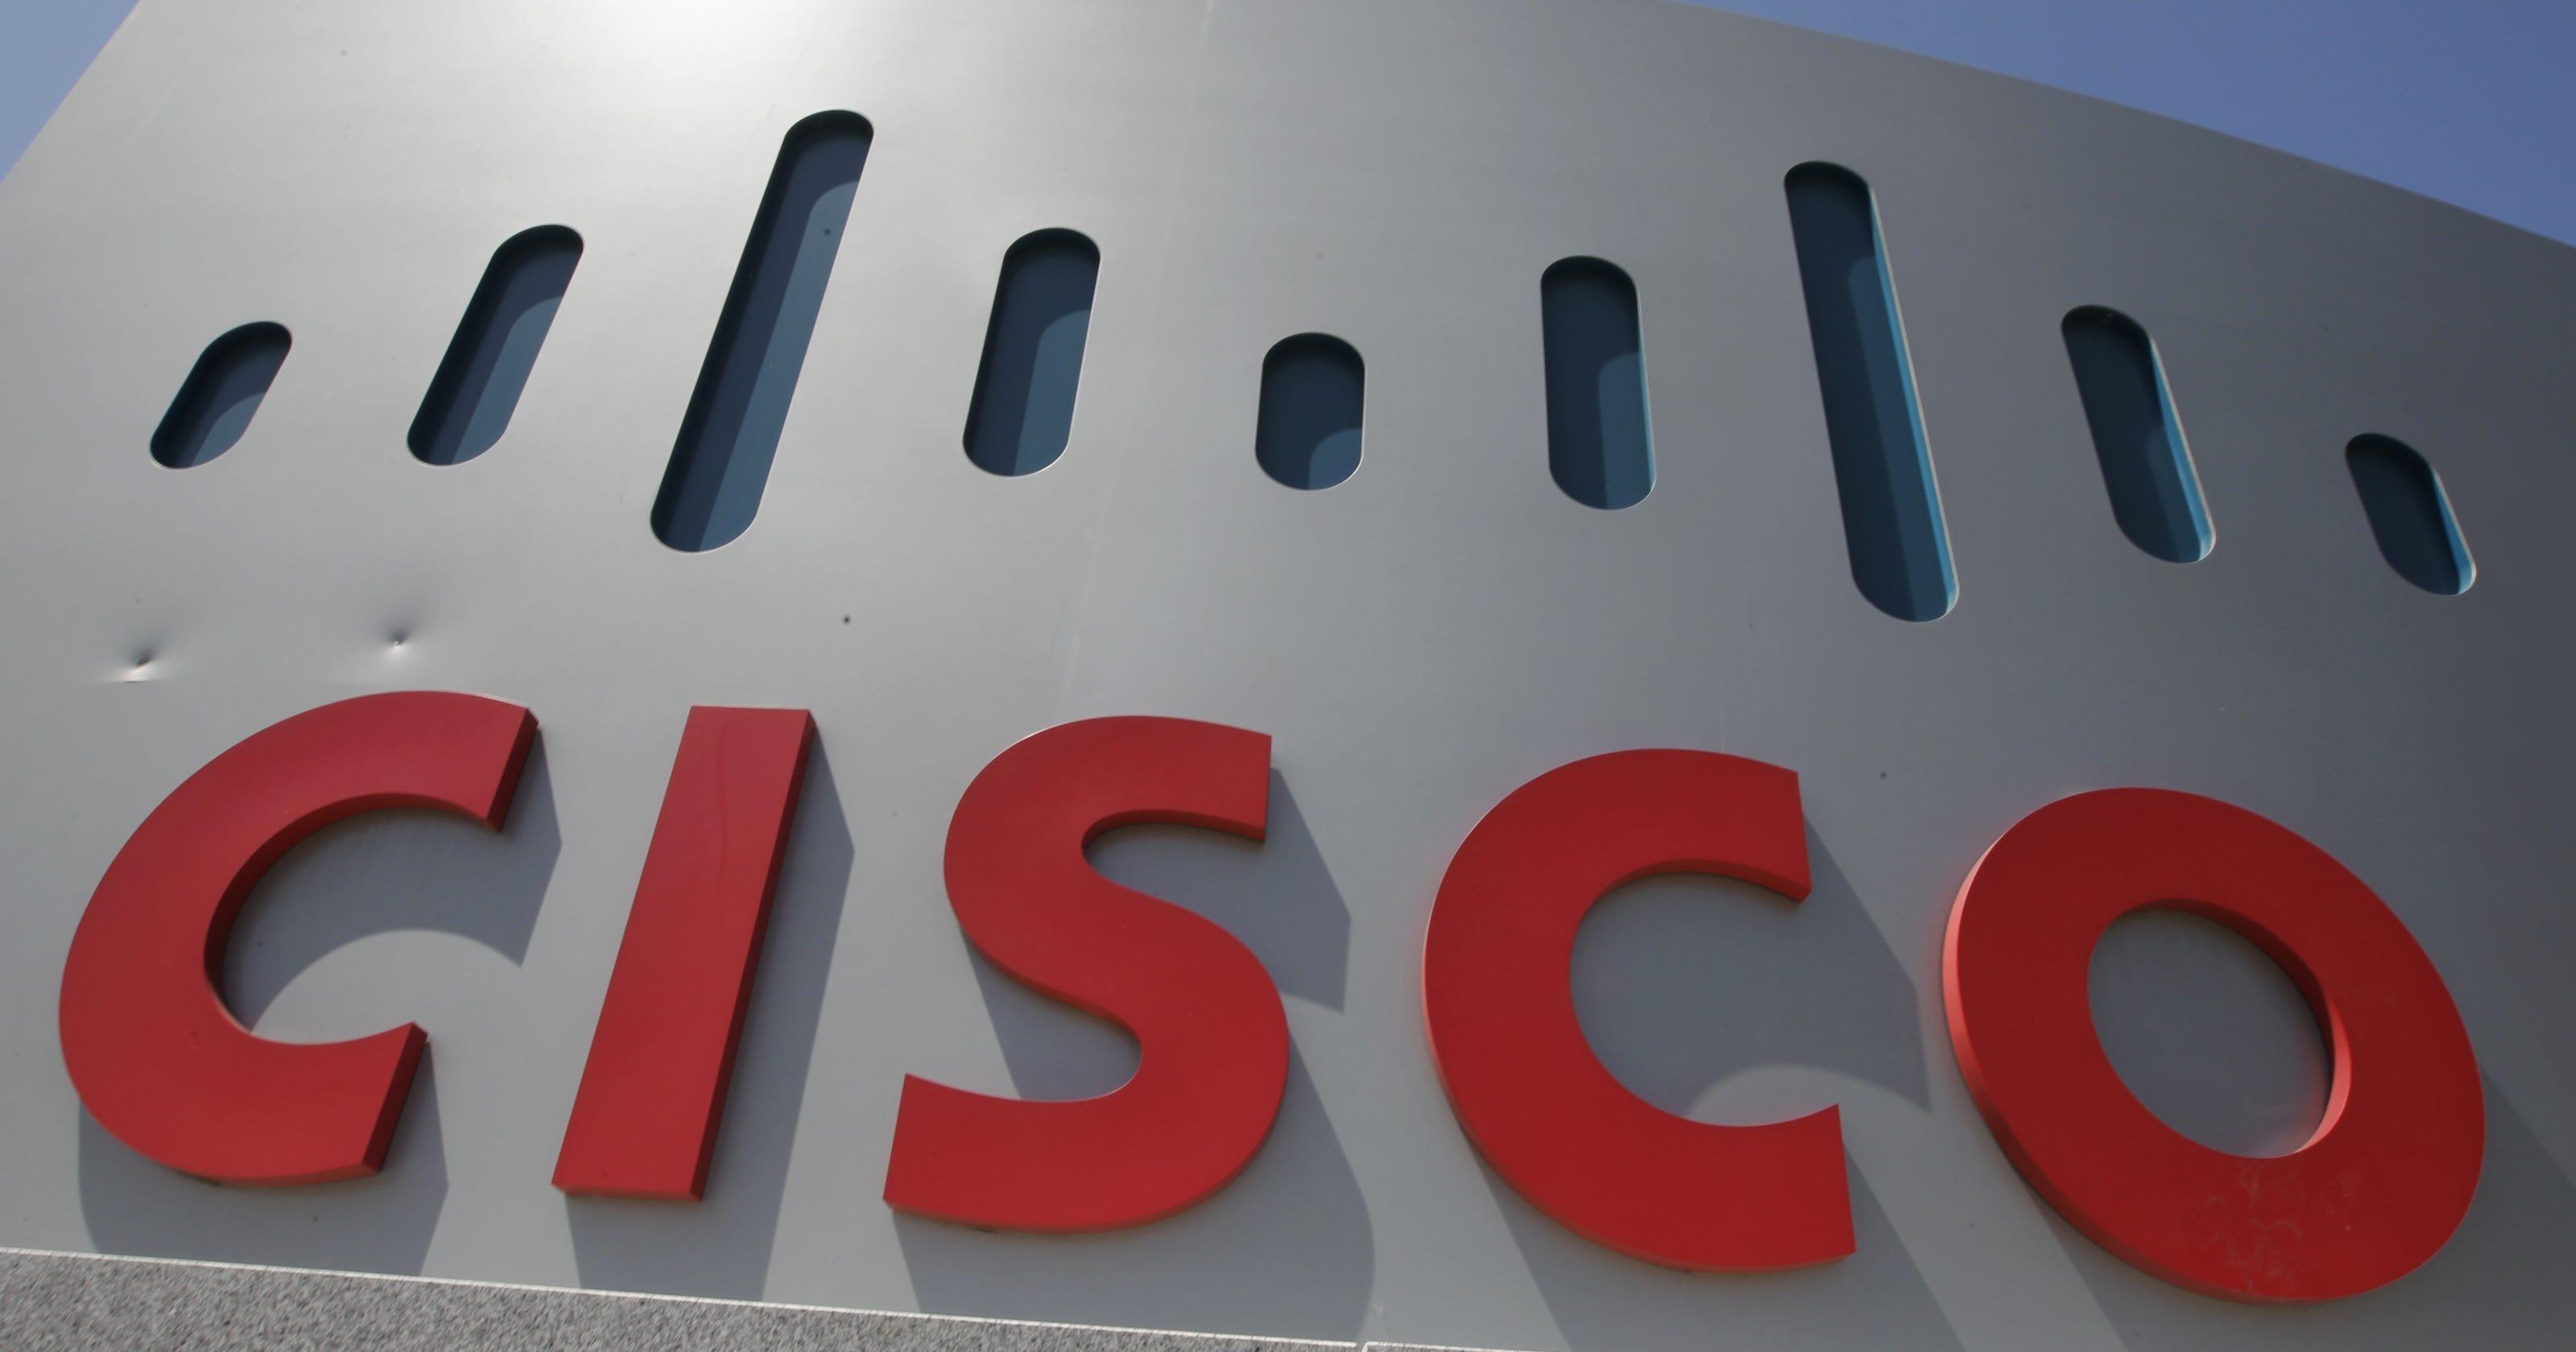 Cisco Systems to buy Meraki for $1 2 billion